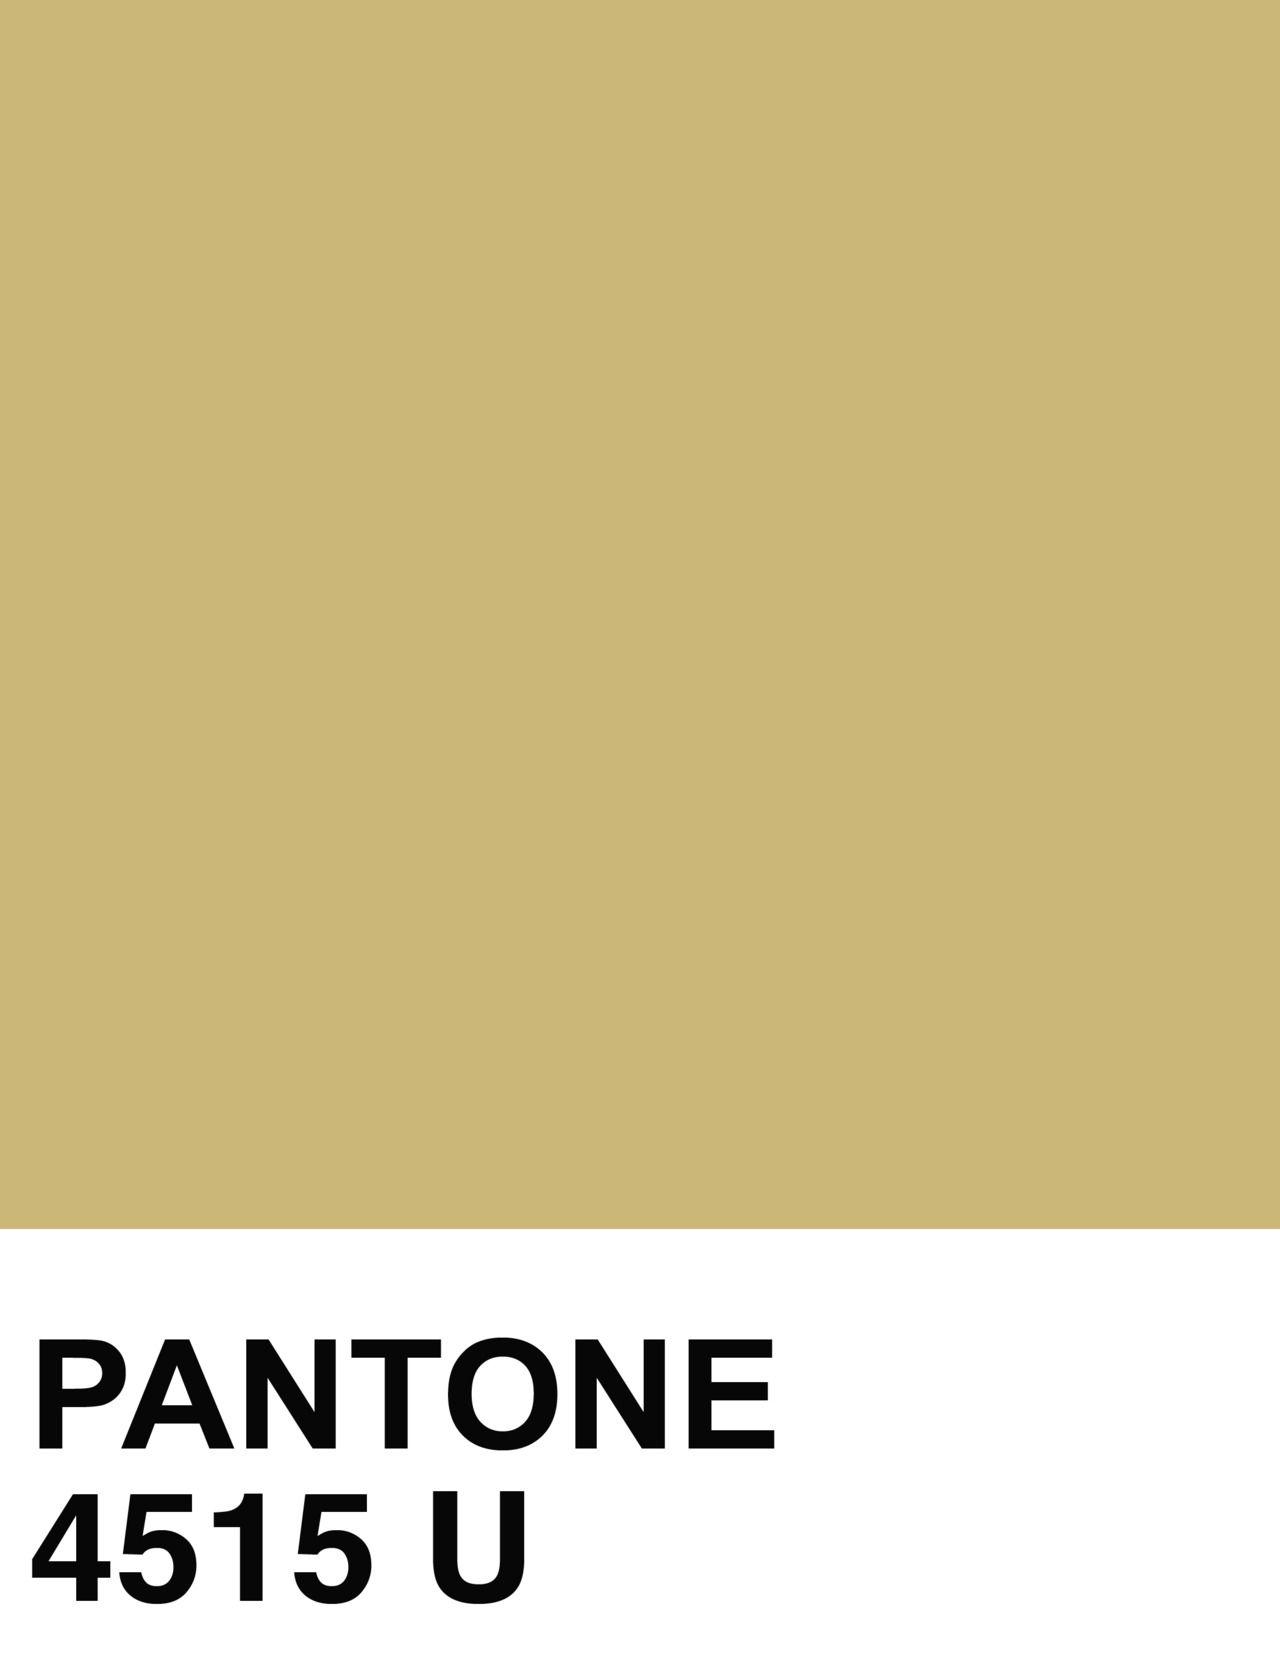 Pantone Solid Uncoated Photo